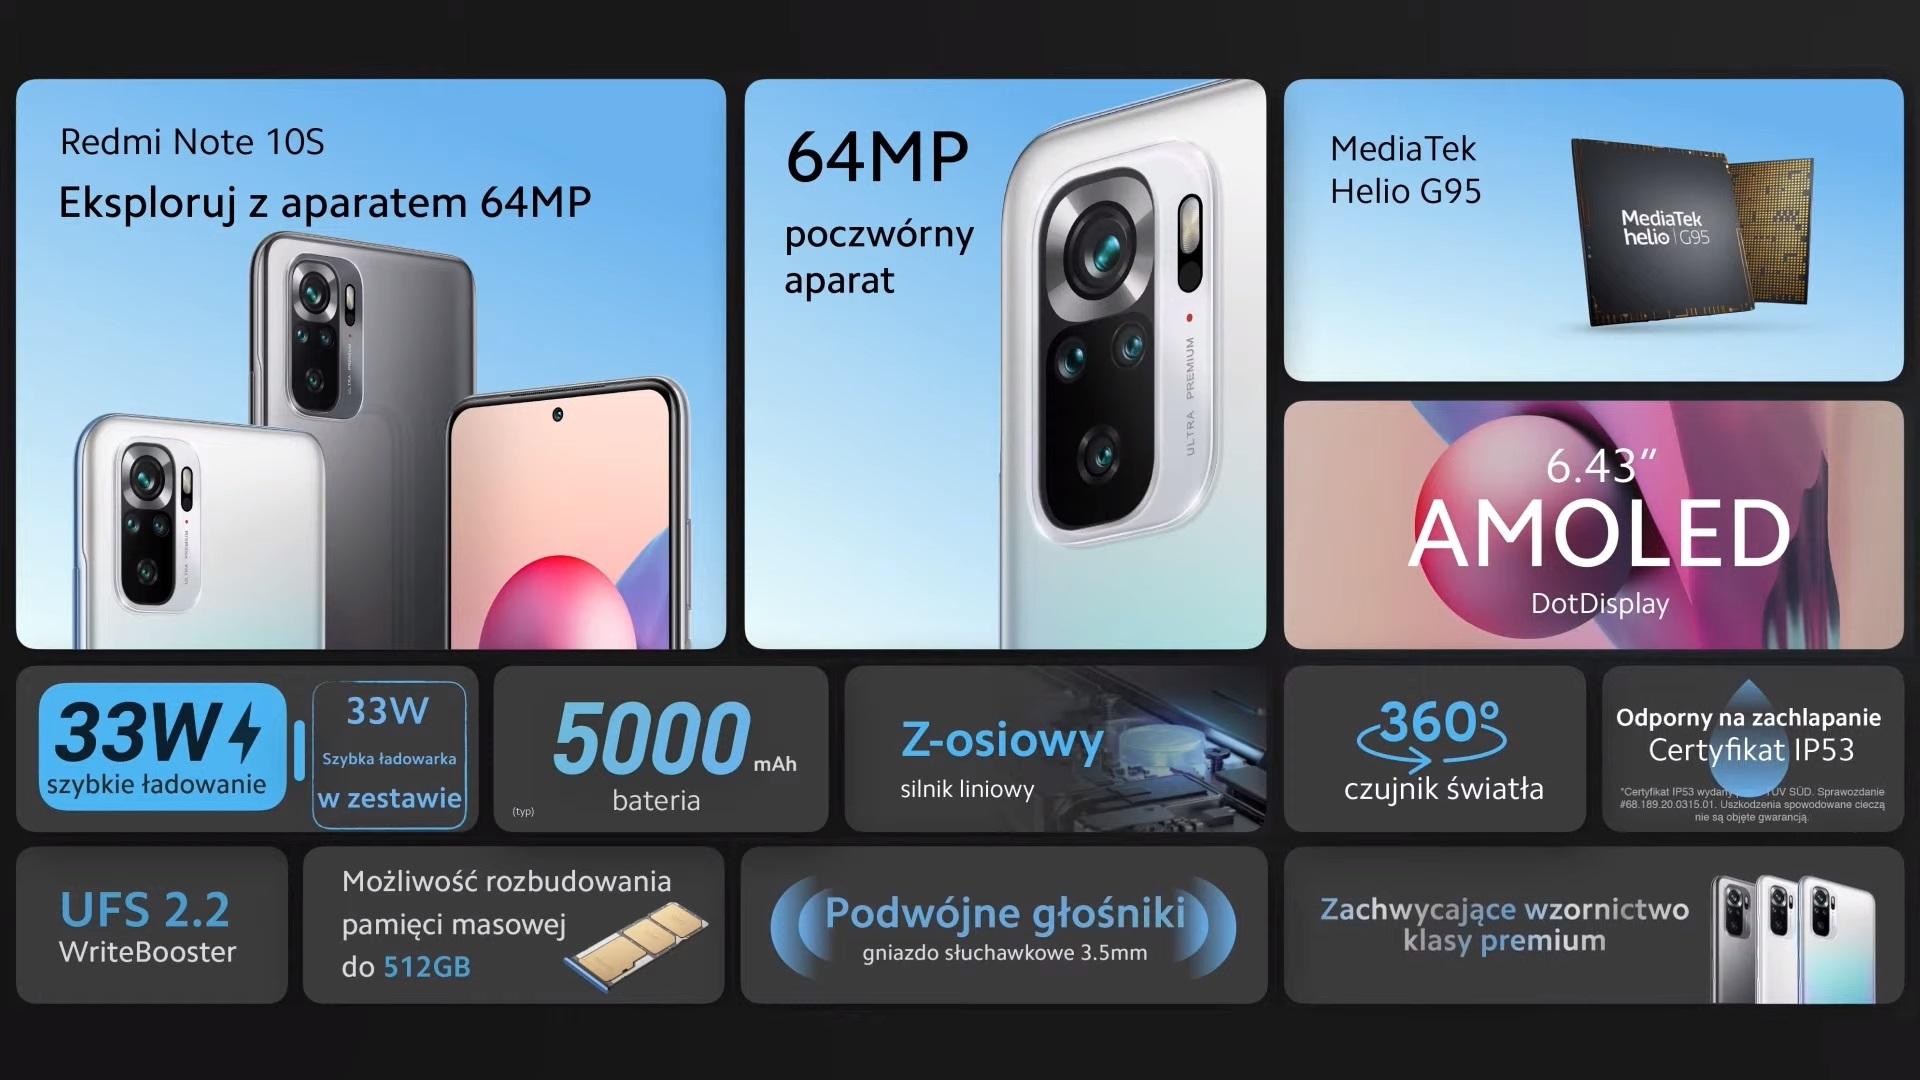 smartfon Redmi Note 10S smartphone specyfikacja